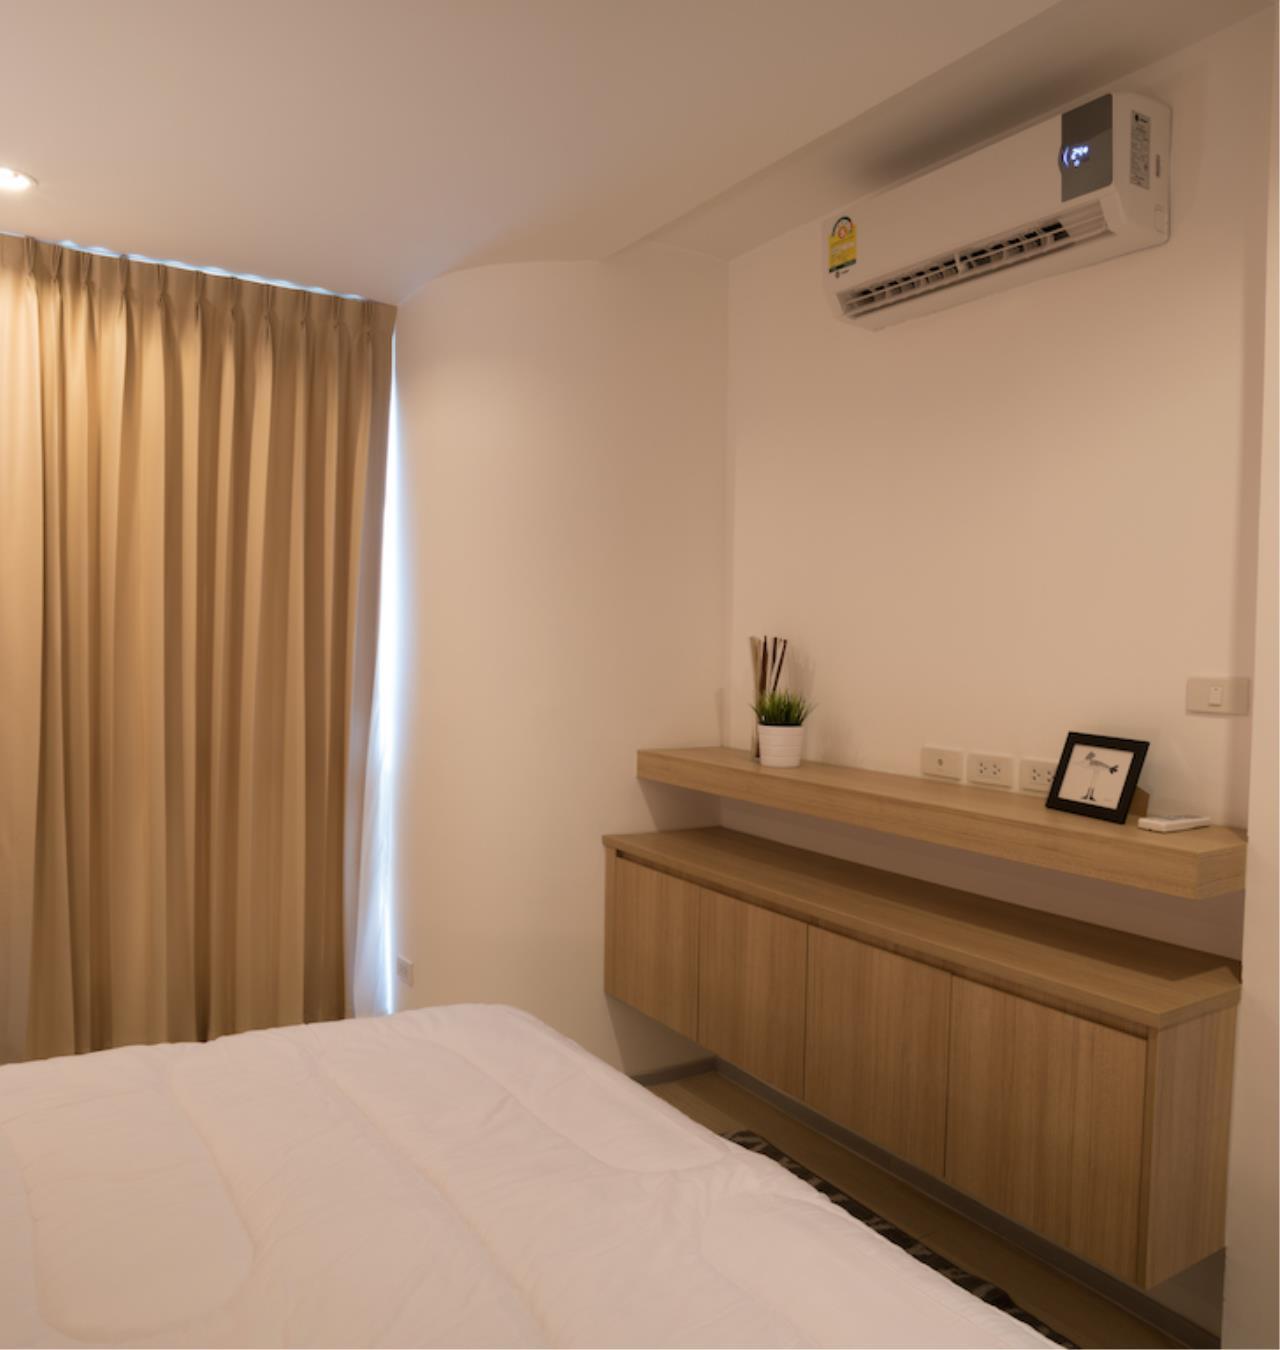 Real Estate in Pattaya Agency's 1 Bed Room - Chezz Pattaya Condo 8